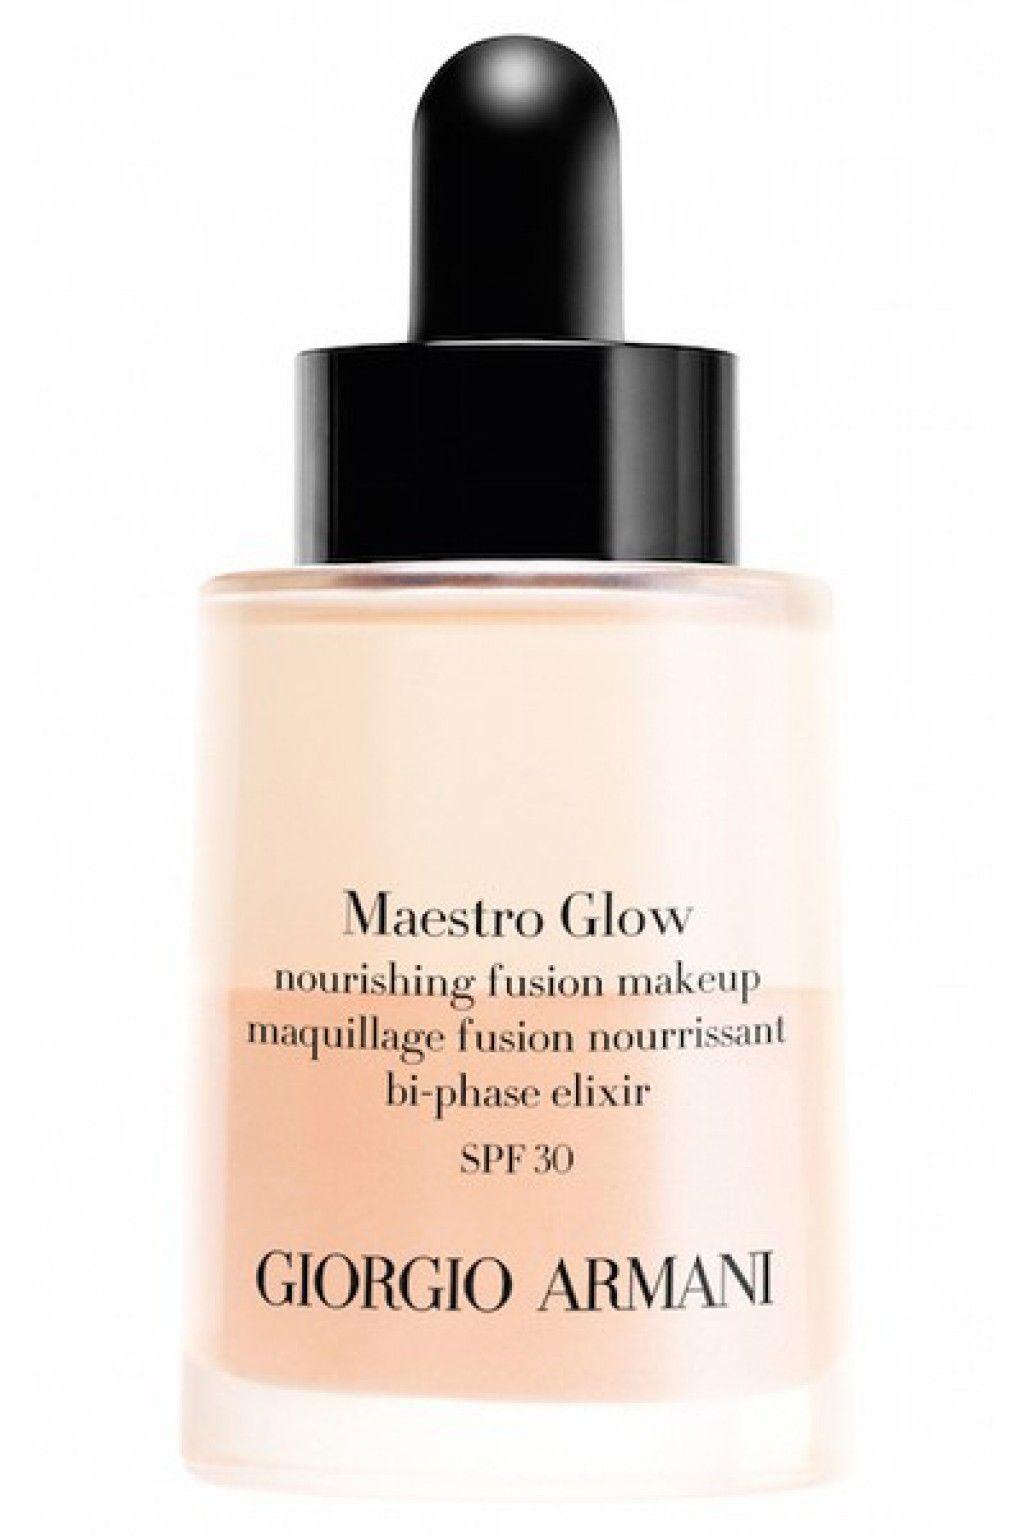 Giorgio Armani Beauty Maestro Glow Nourishing Fusion